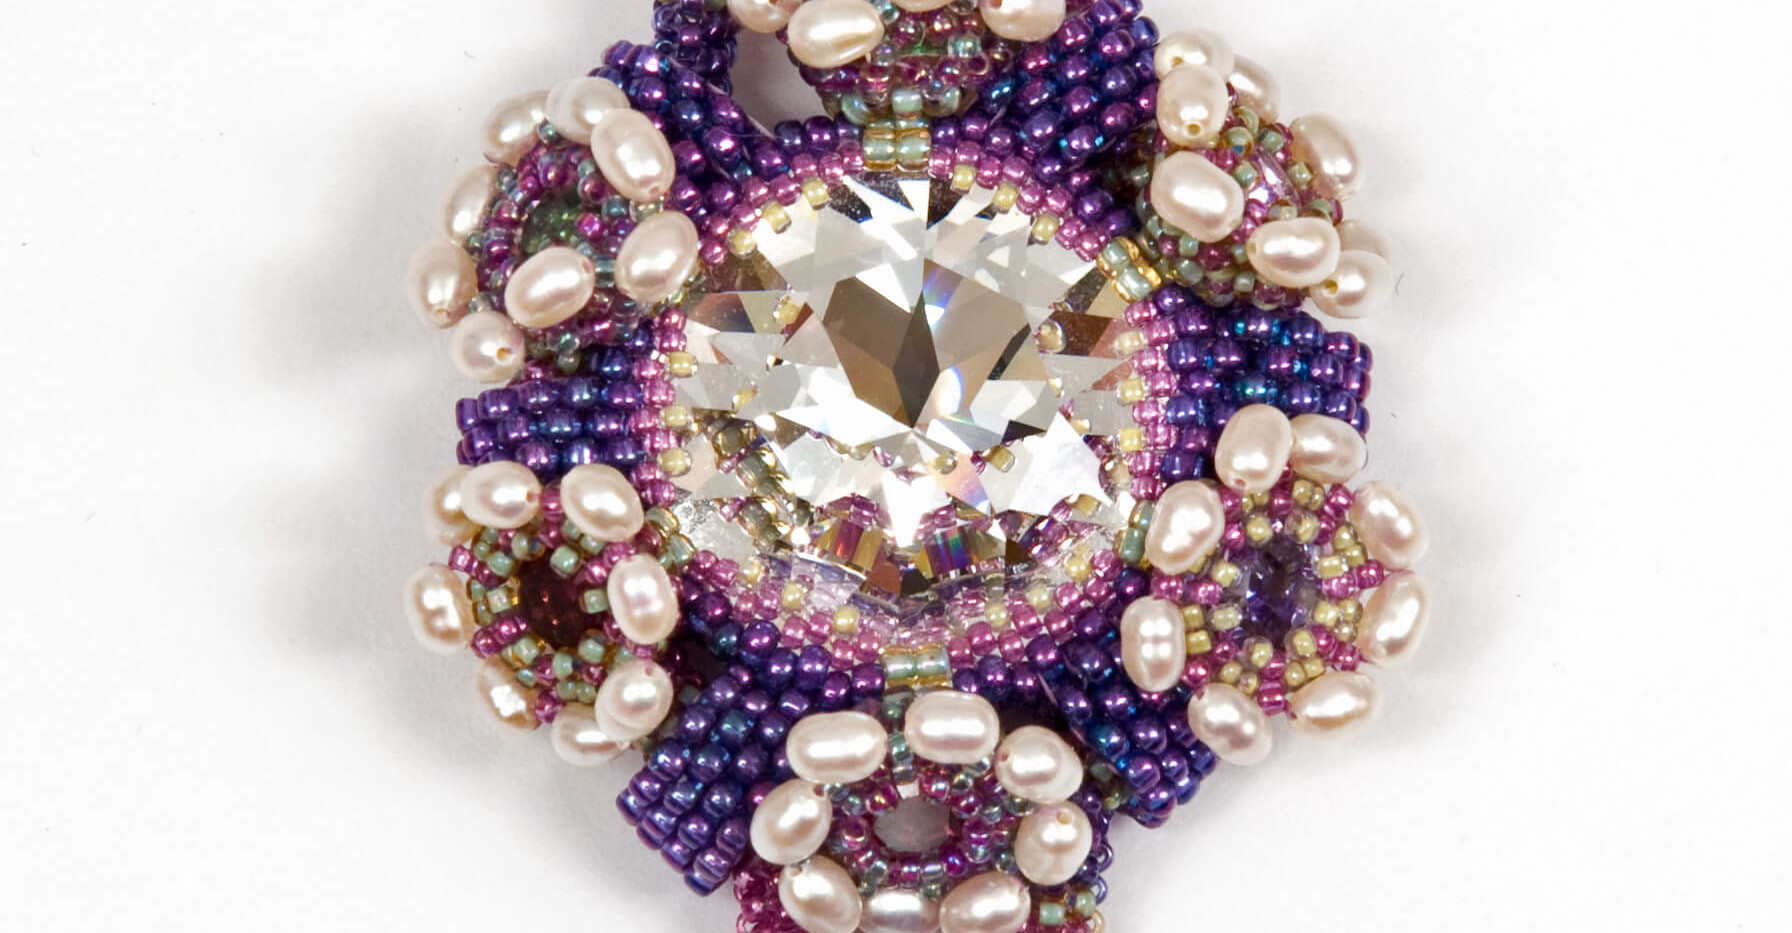 Purples Closeup